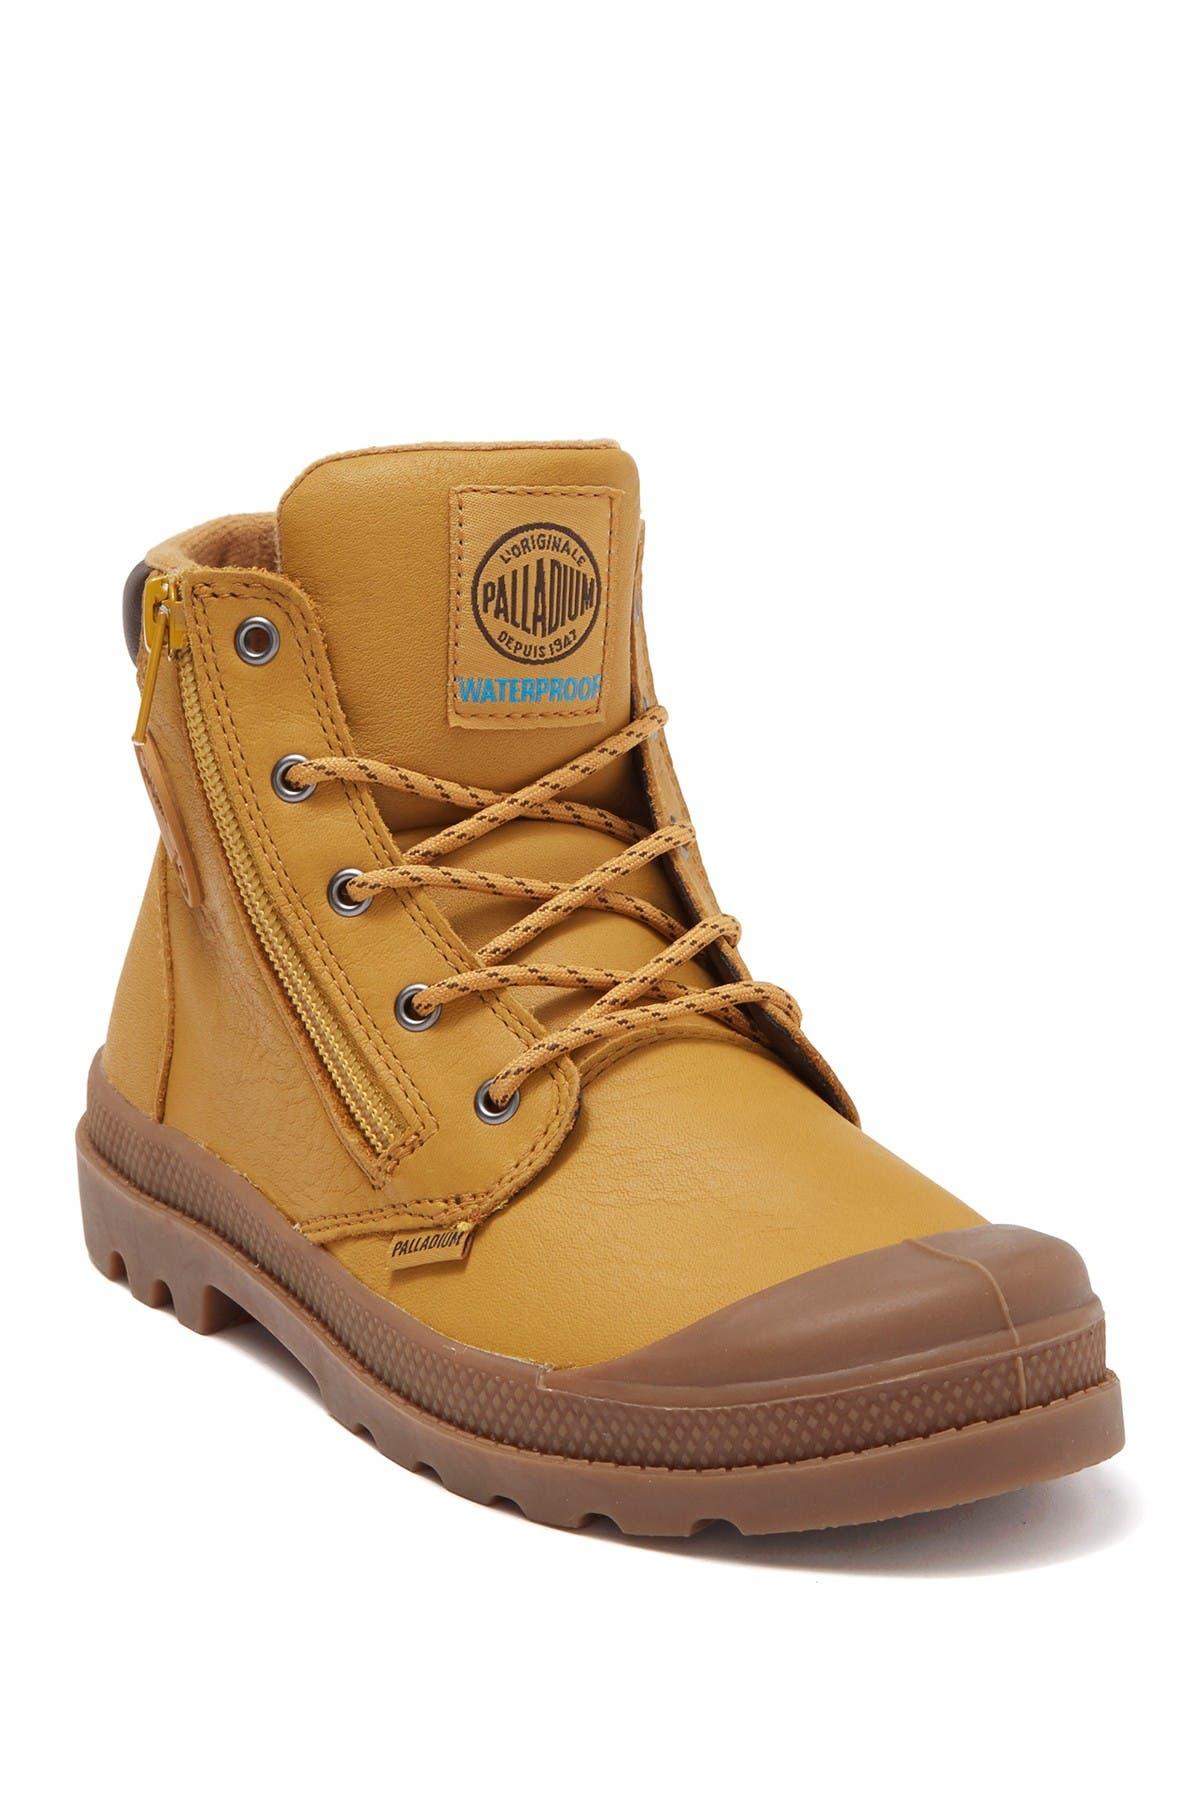 Image of PALLADIUM Pampa Hi Waterproof Boot